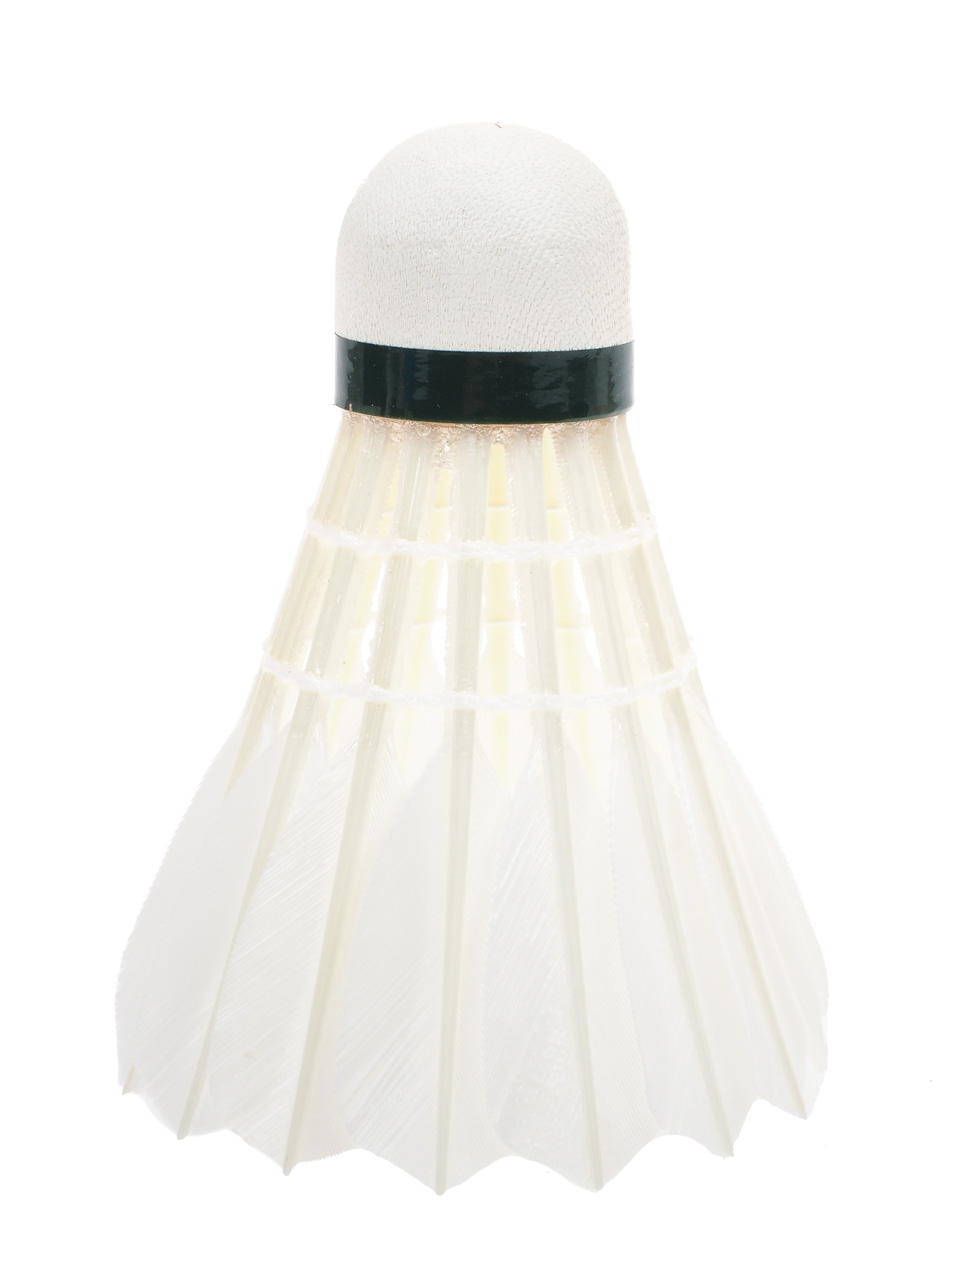 Frill-Badminton-Yonex-Aerosens-as30-Yonex-White-32488-New thumbnail 5